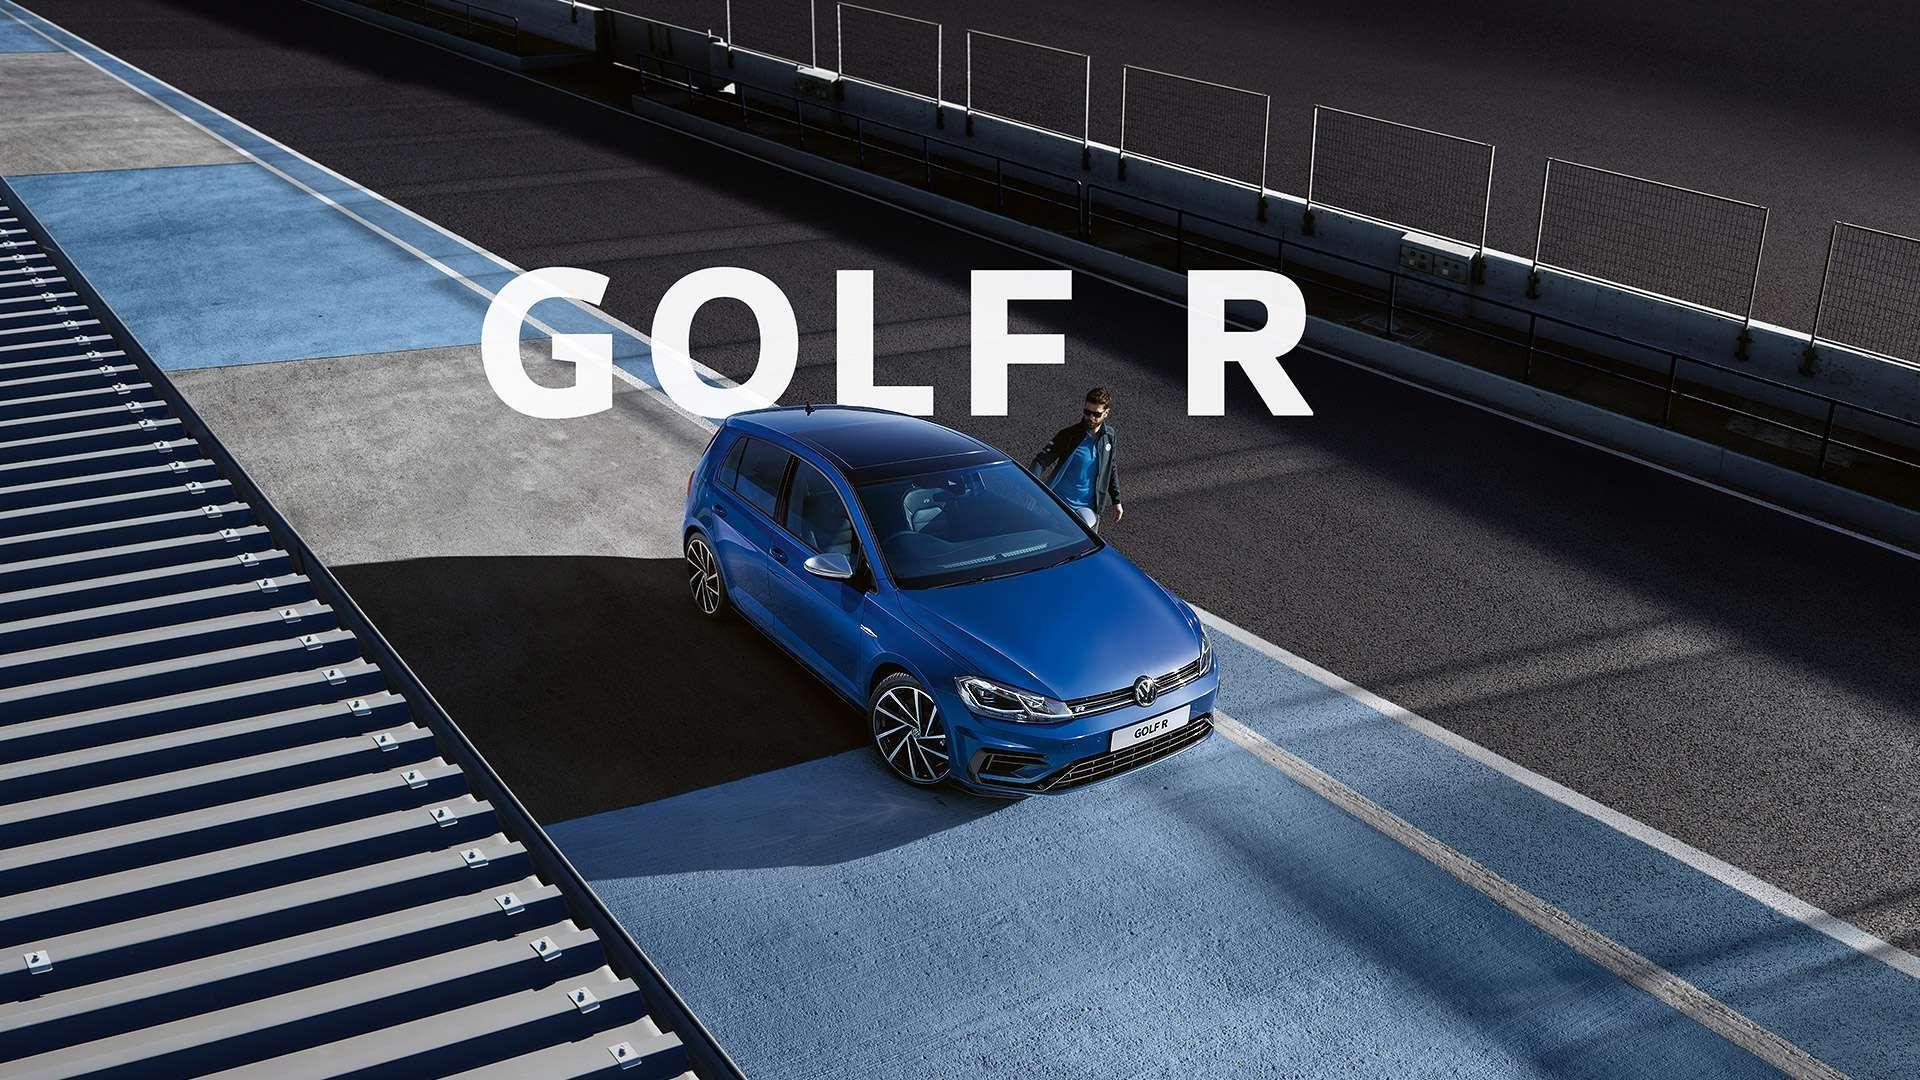 Lapiz Blue metallic Golf R parked by a man. a man